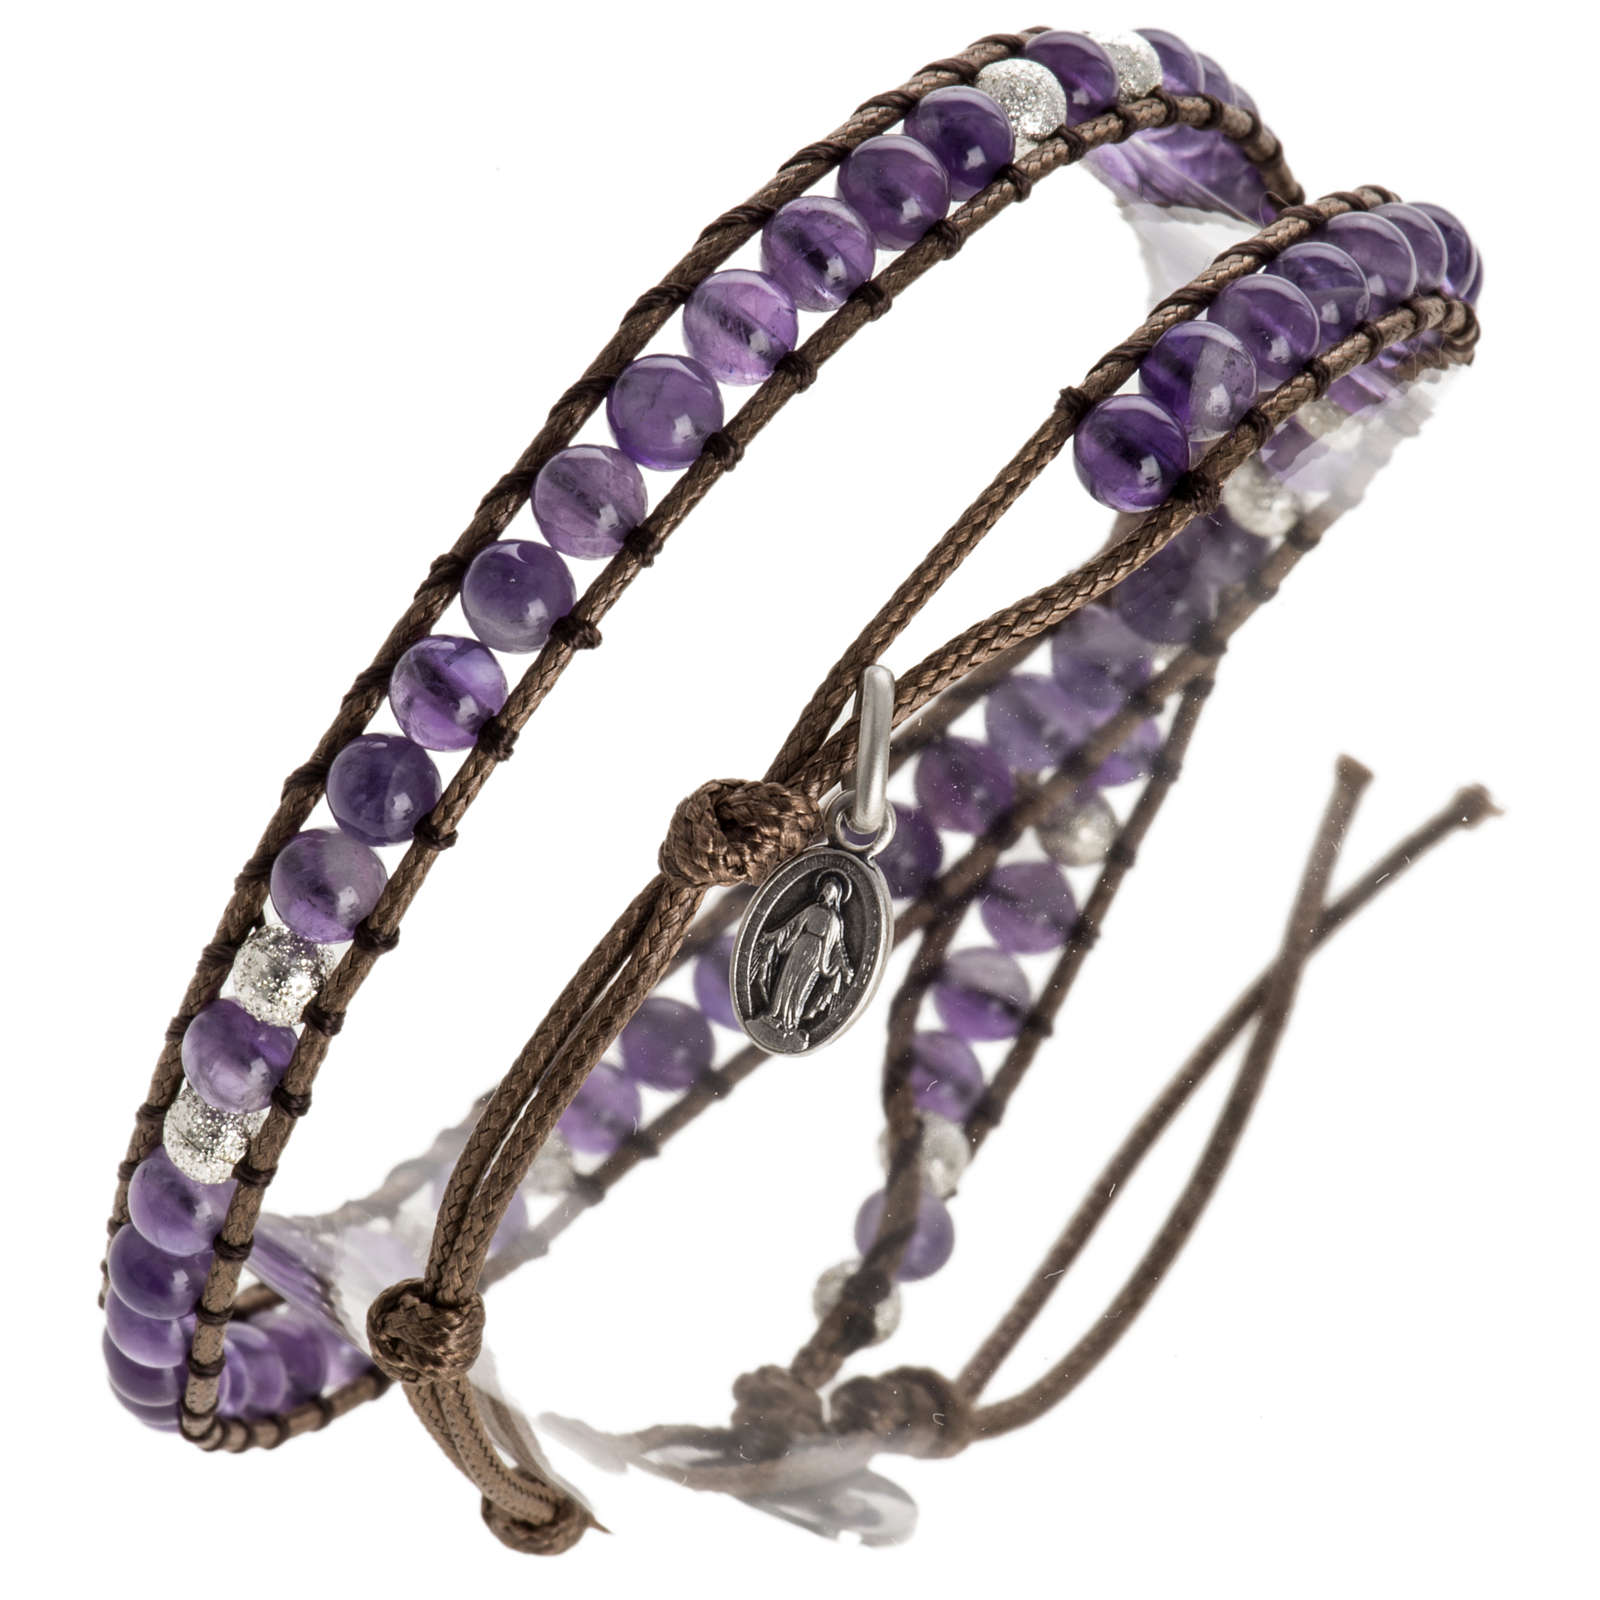 Amethyst bracelet 4mm 4